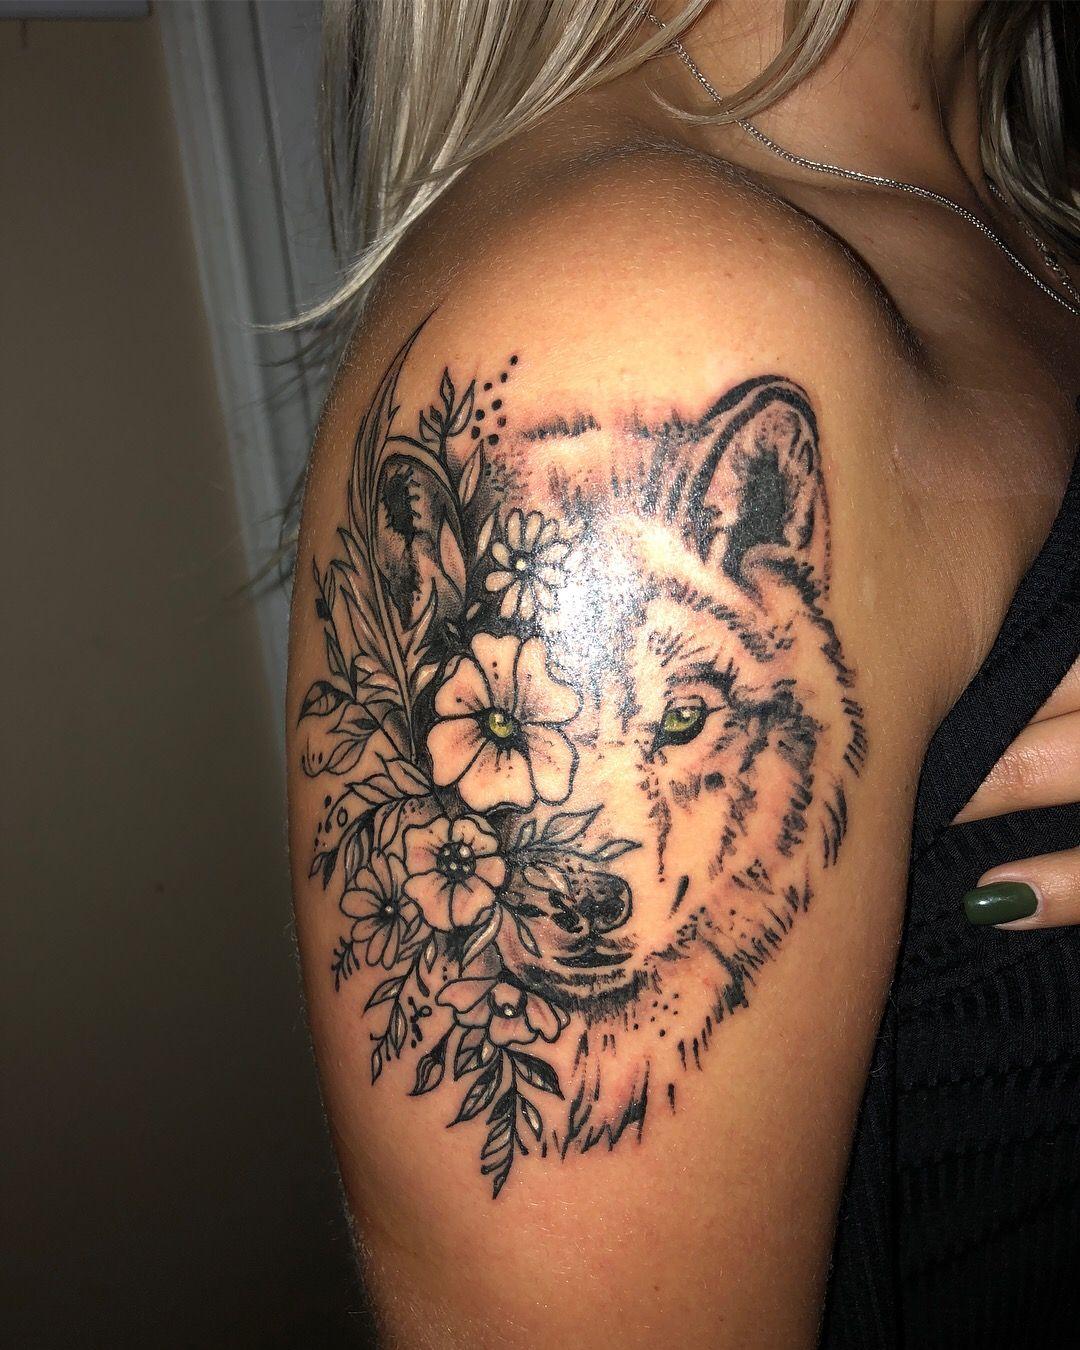 Wolf Tattoo With Flowers My Spirit Animal Wolf Tattoos For Women Animal Tattoos For Women Nature Tattoo Sleeve